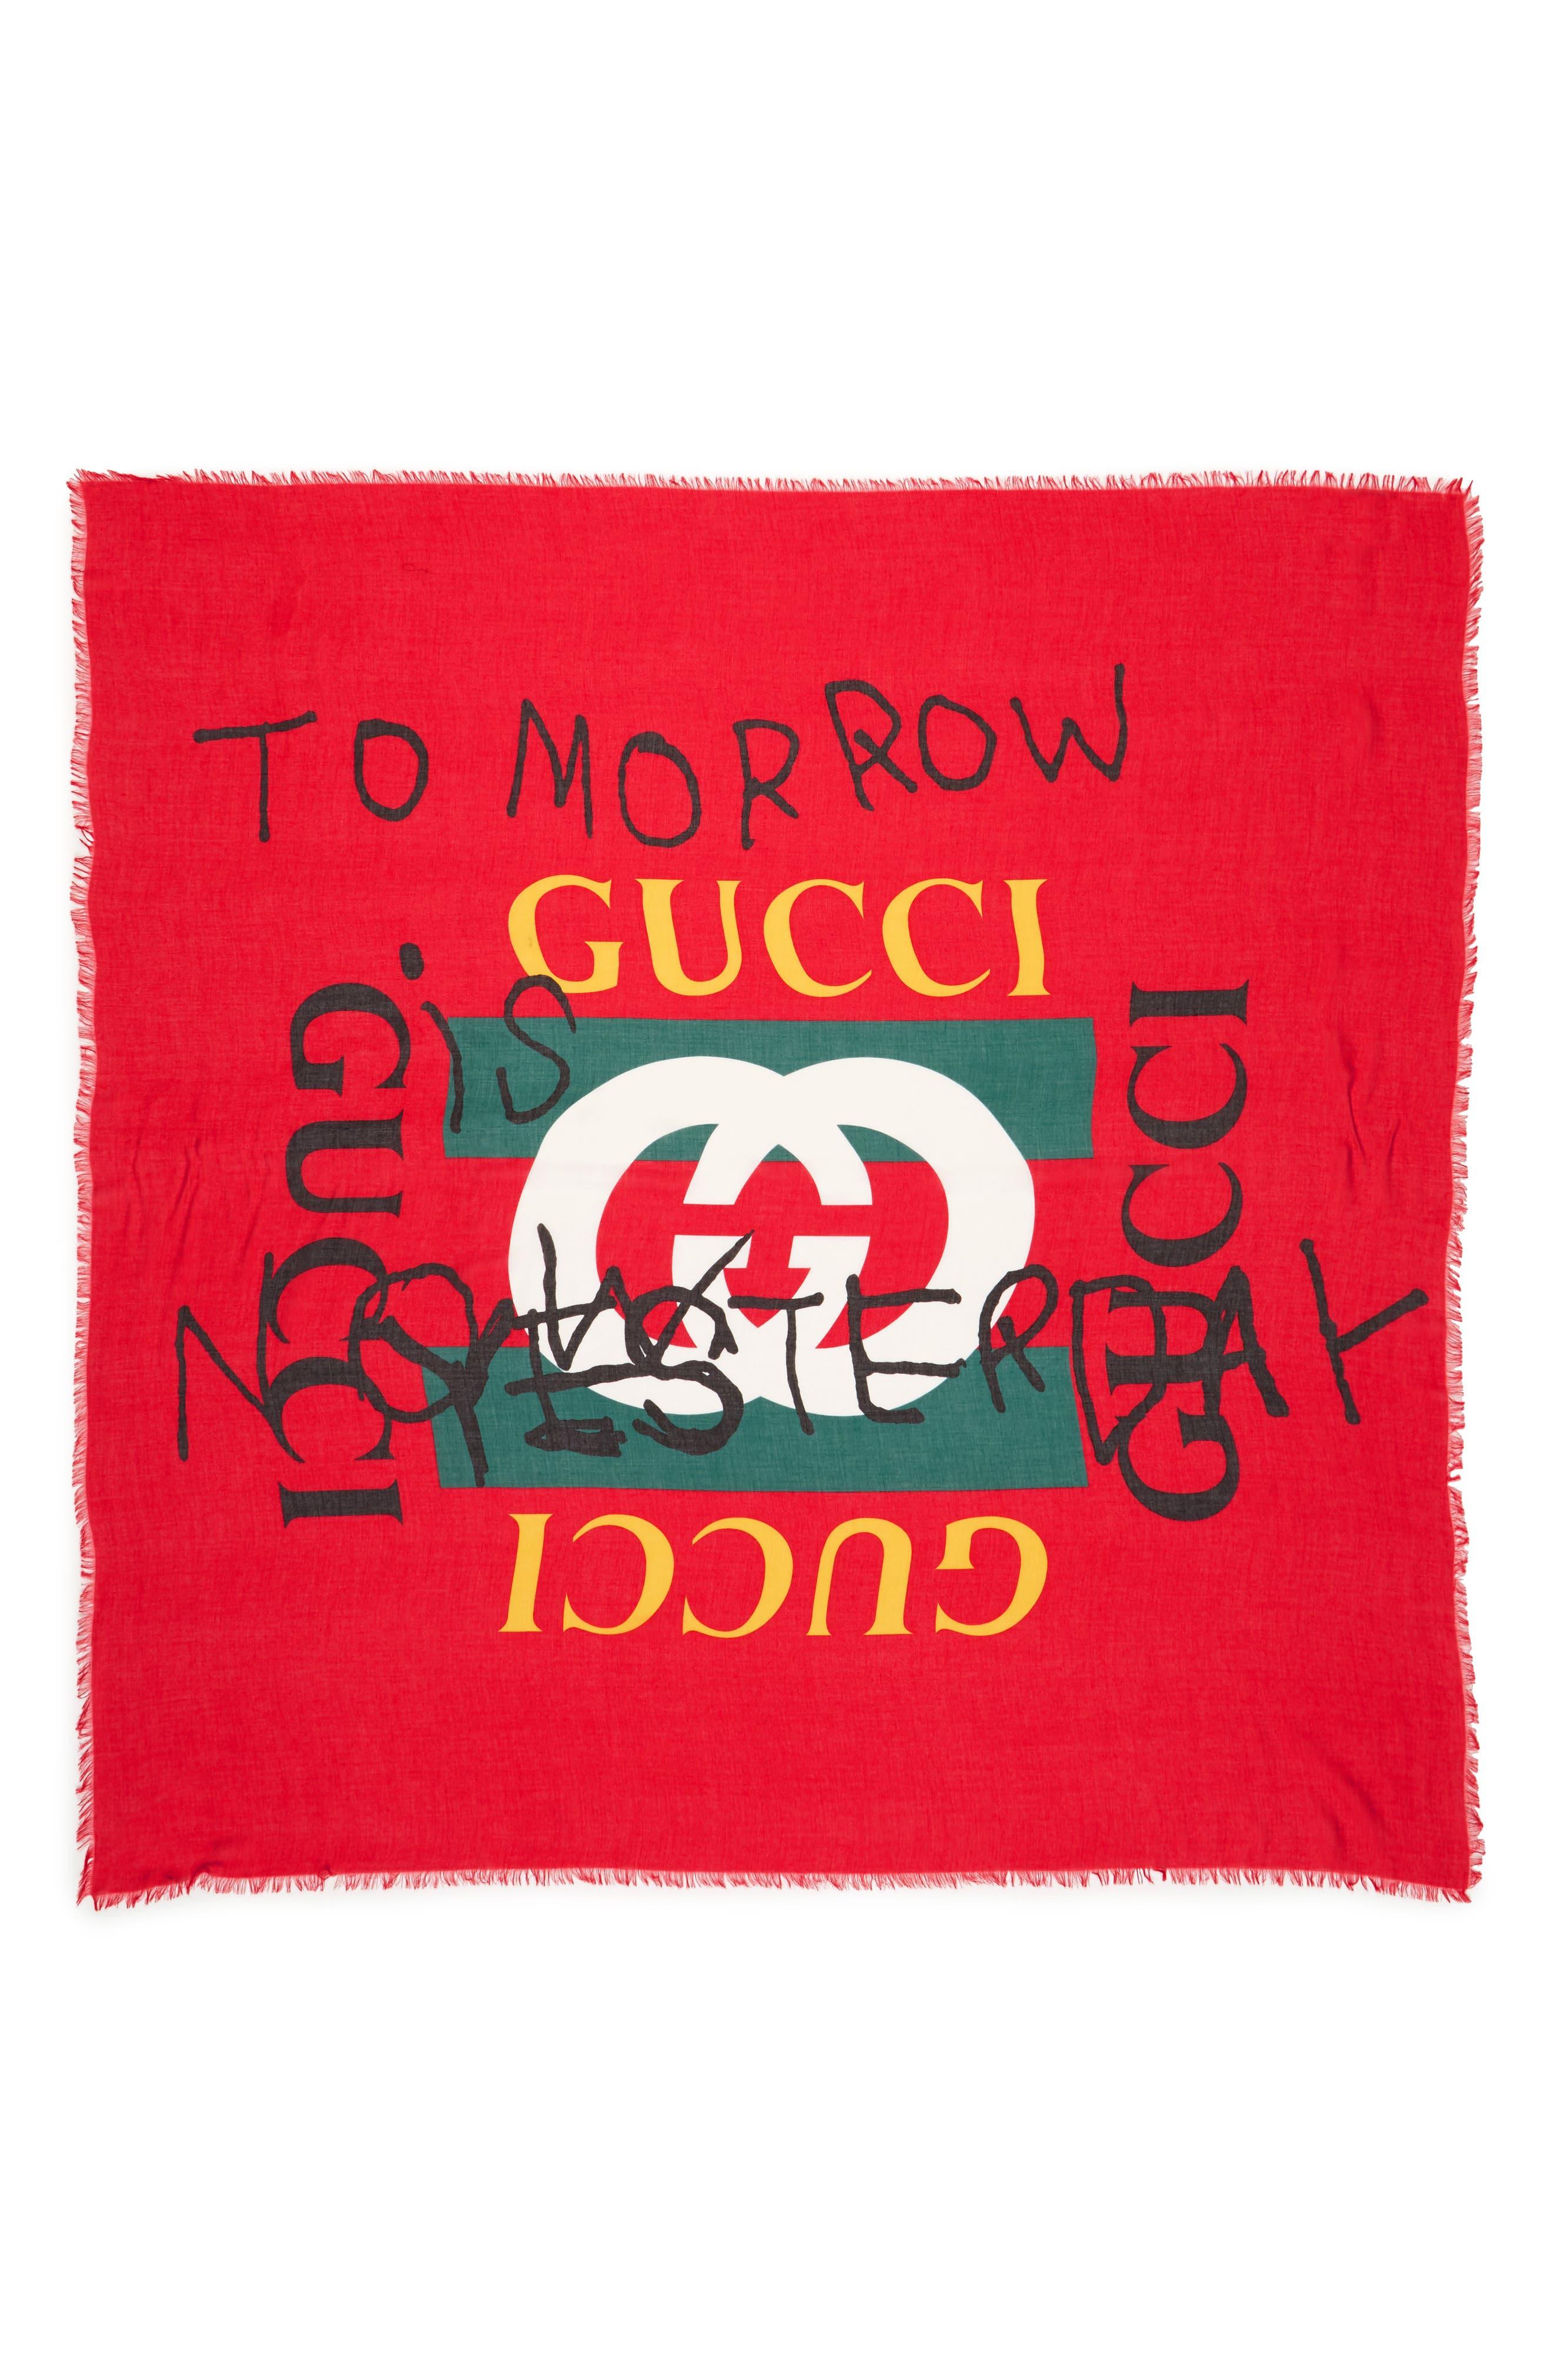 Gucci Coco Capitán Print Scarf